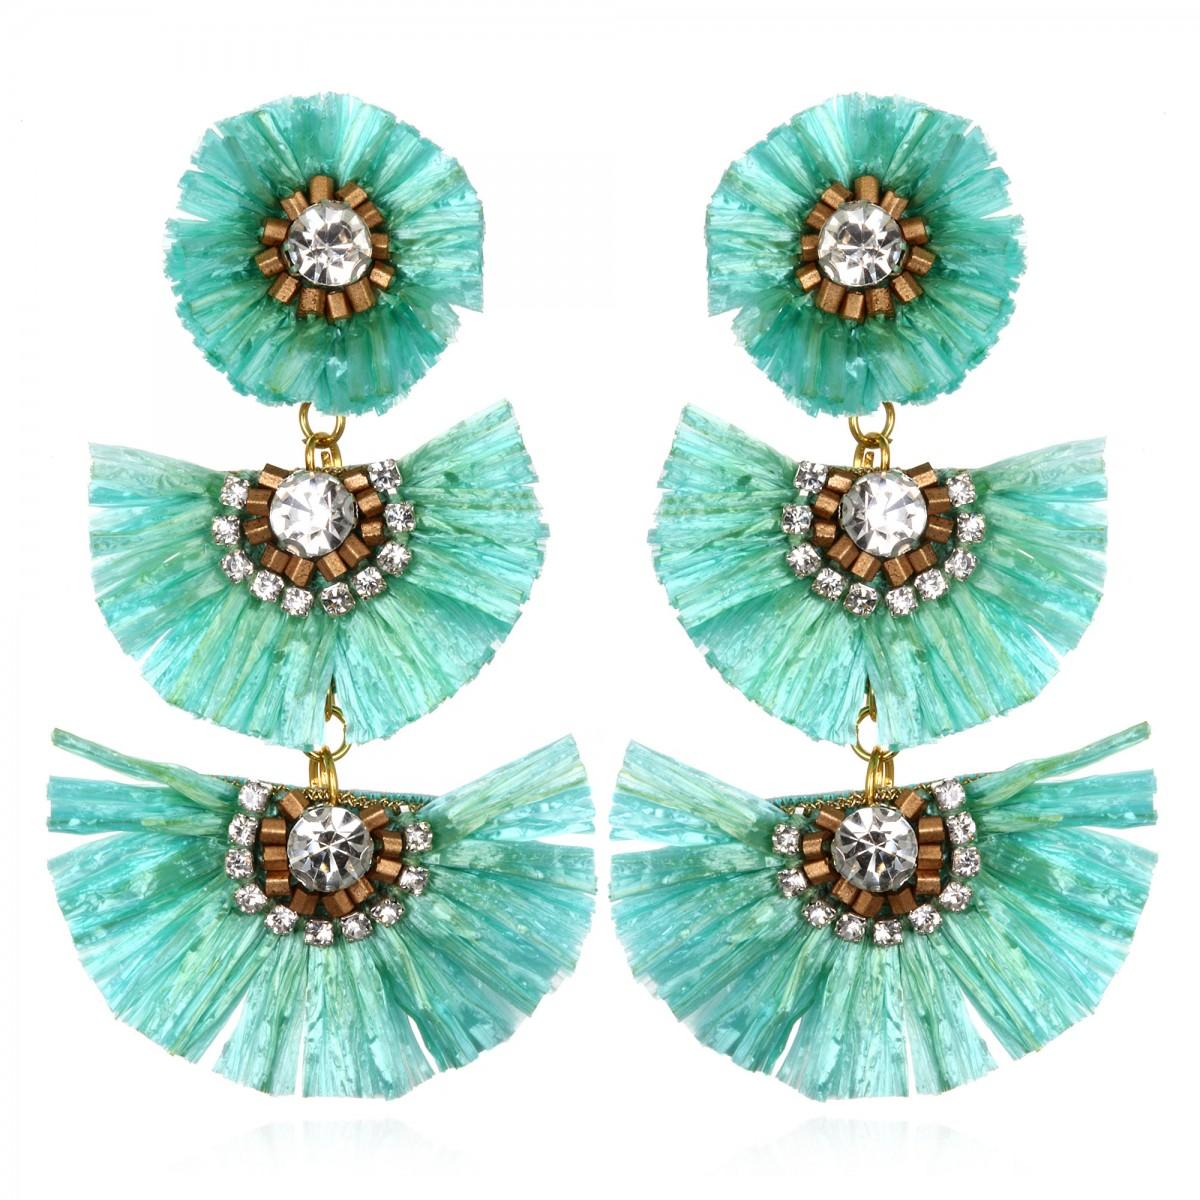 Tuquoise Rafia Fan  Earrings by SUZANNA DAI